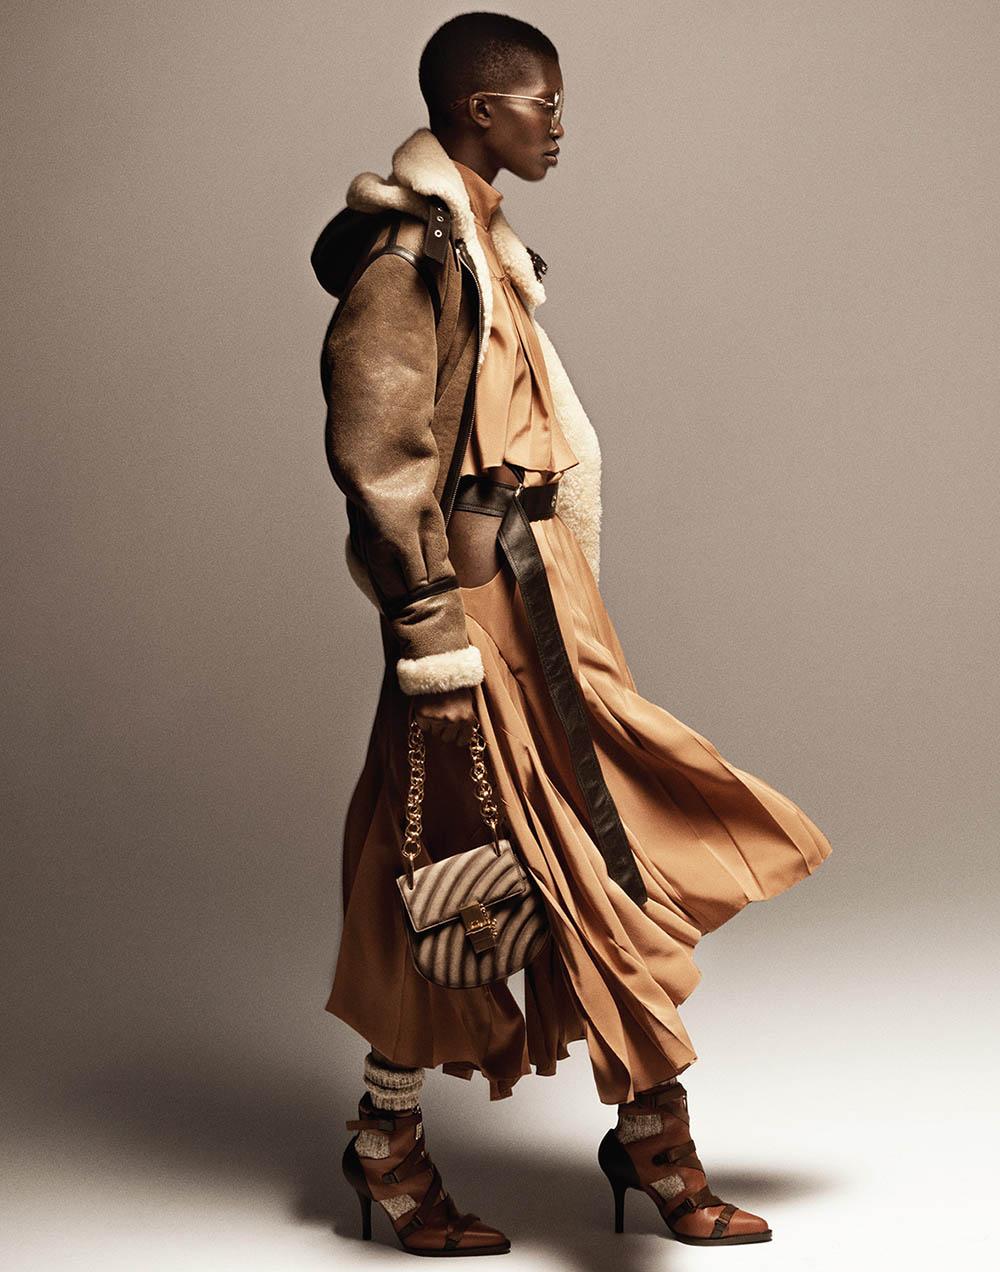 Achok Majak by Tom Schirmacher for Elle US October 2018